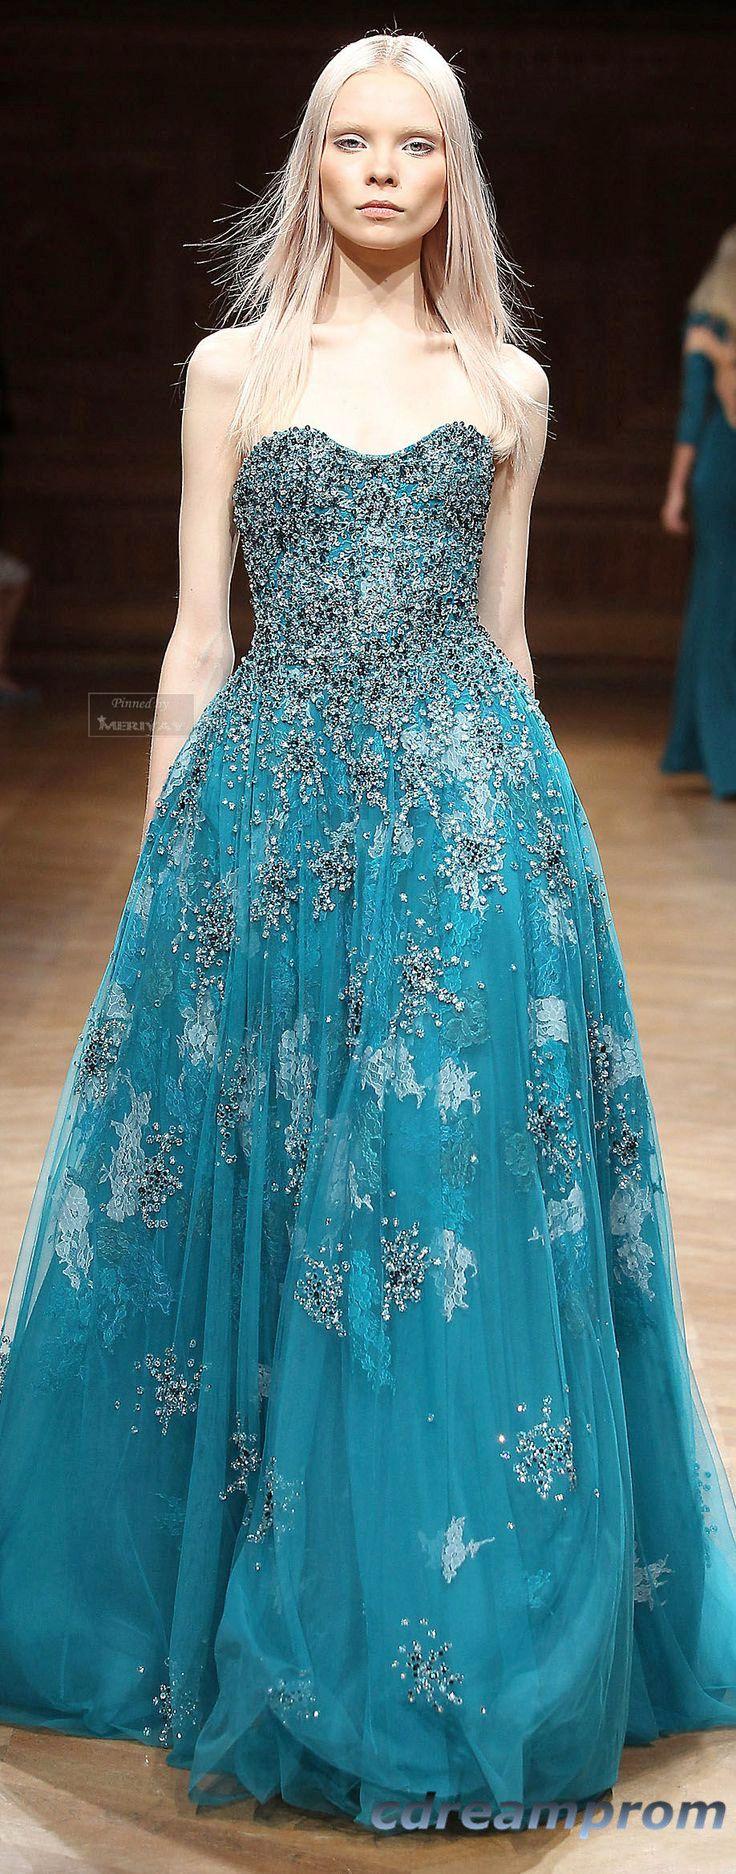 7 best Prom Dresses images on Pinterest | Prom dresses, Dress prom ...